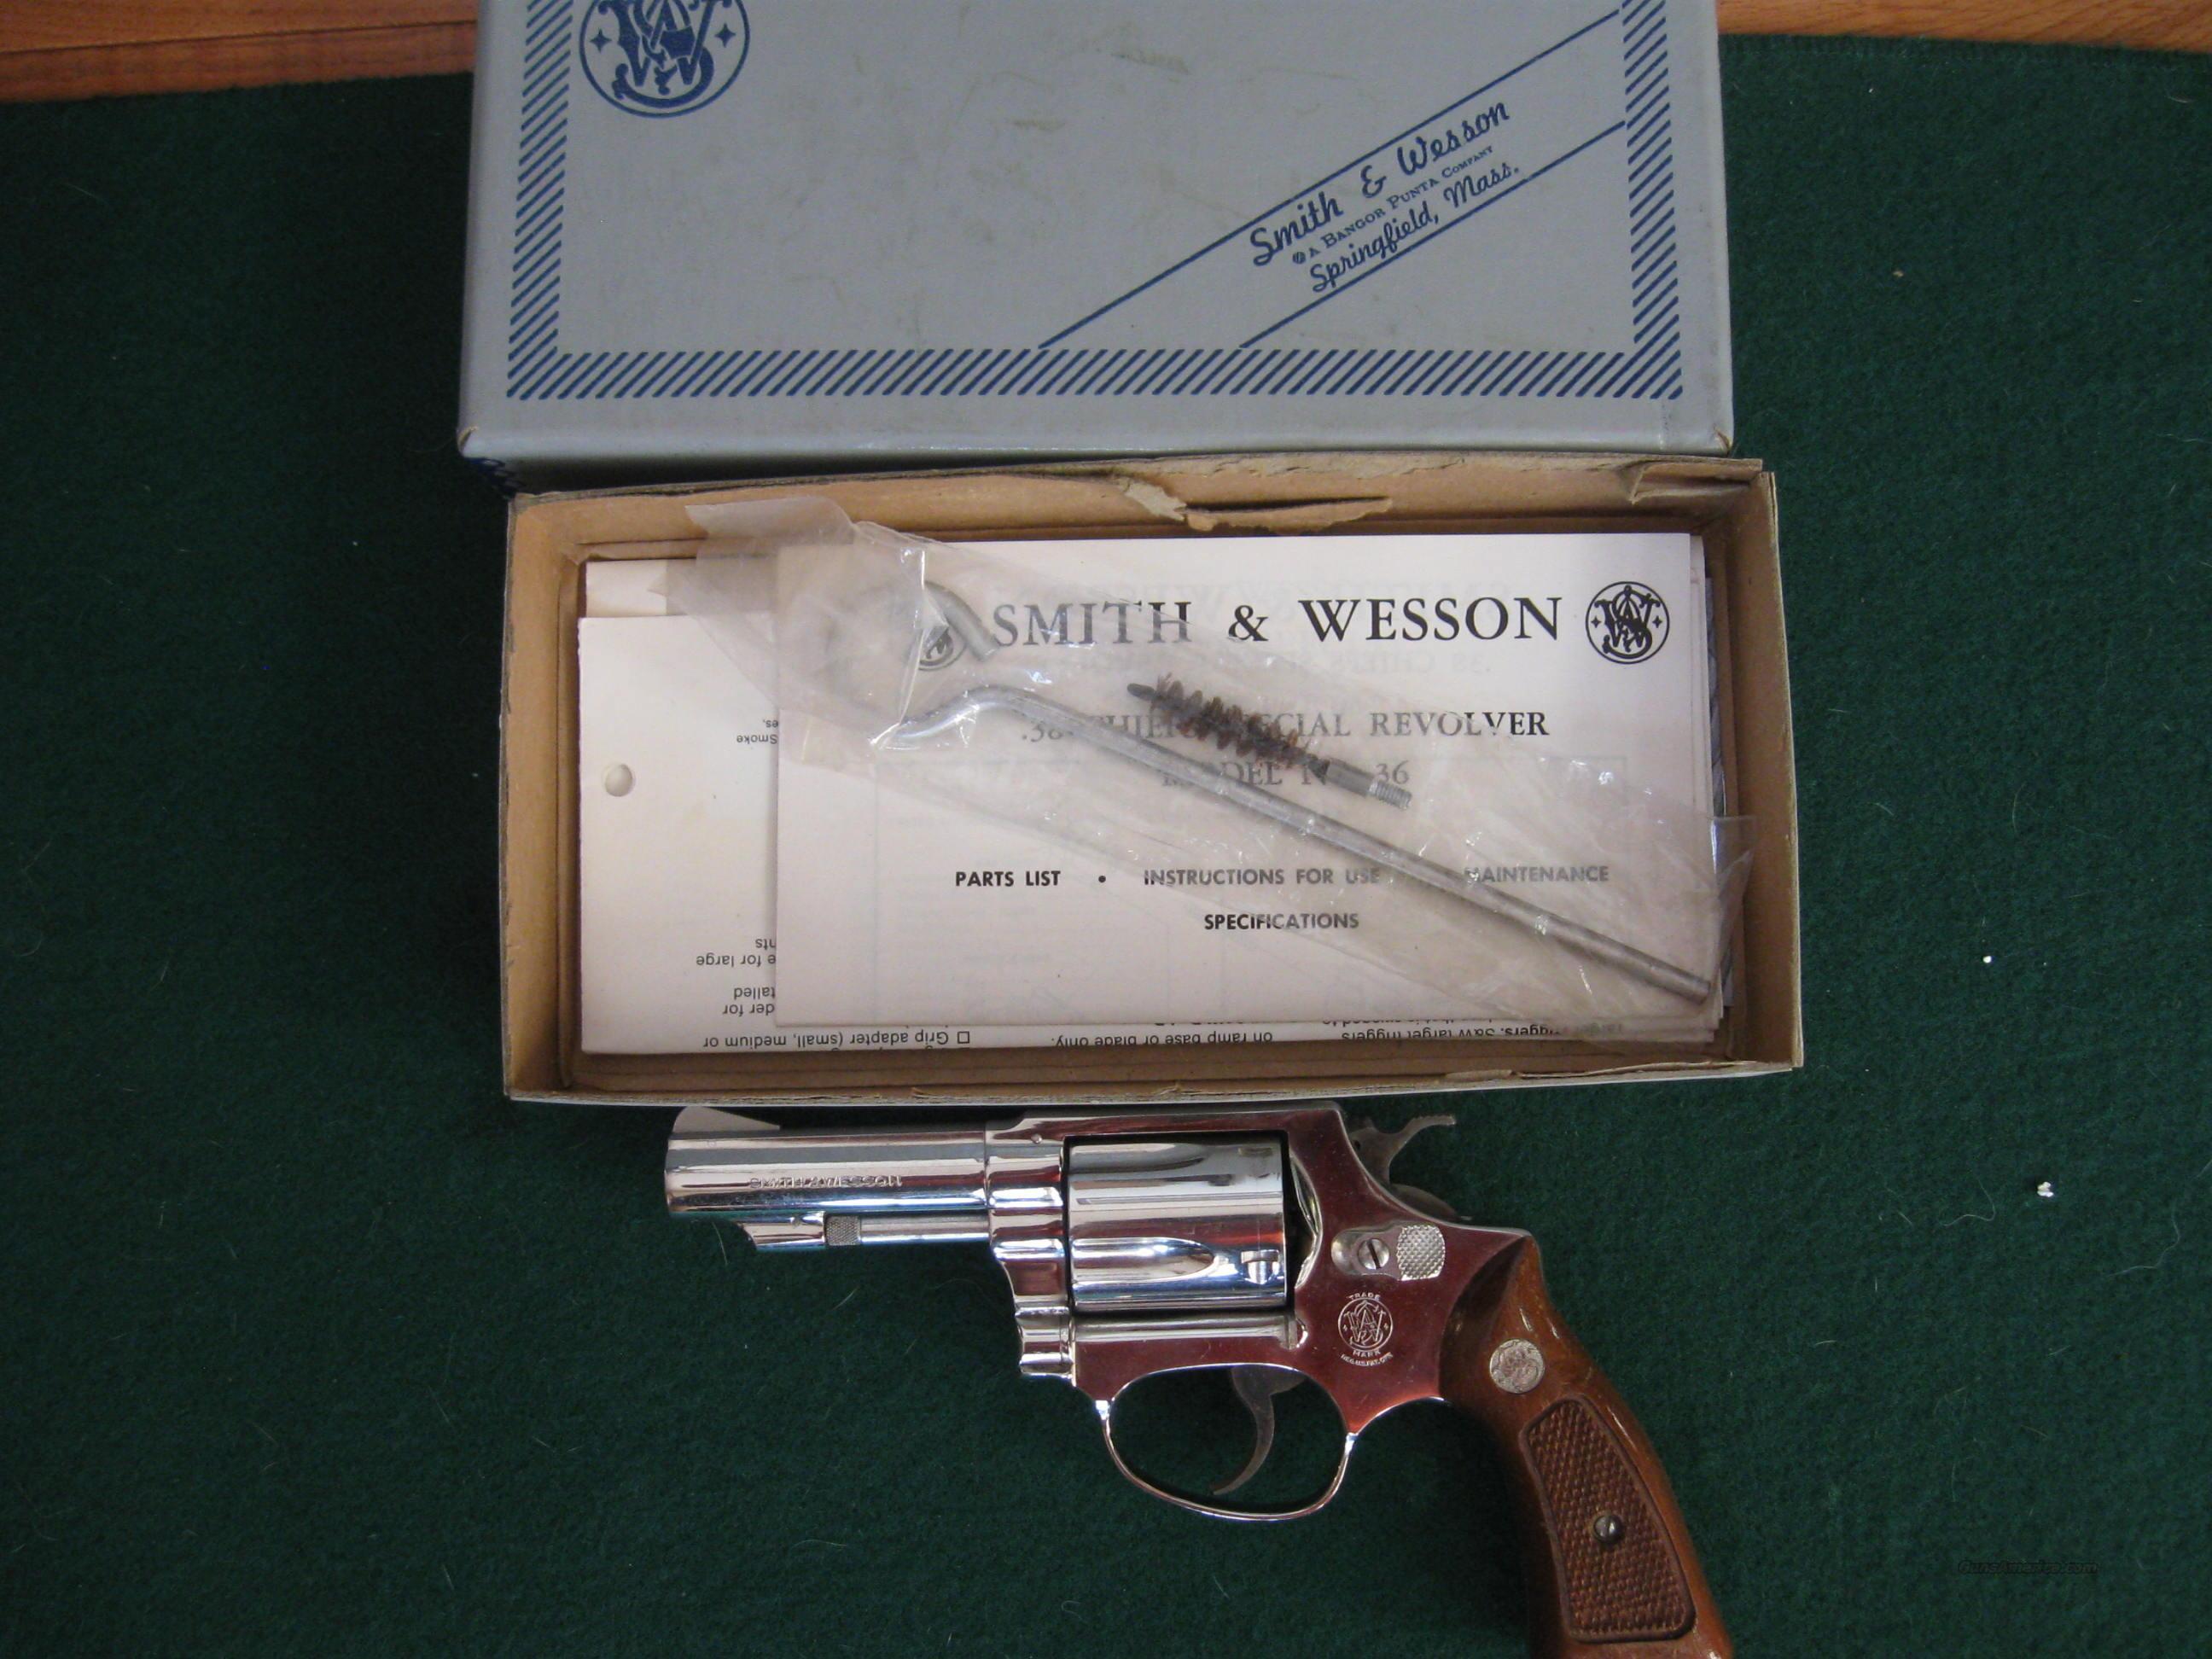 Smith & Wesson 36-1  Guns > Pistols > Smith & Wesson Revolvers > Pocket Pistols